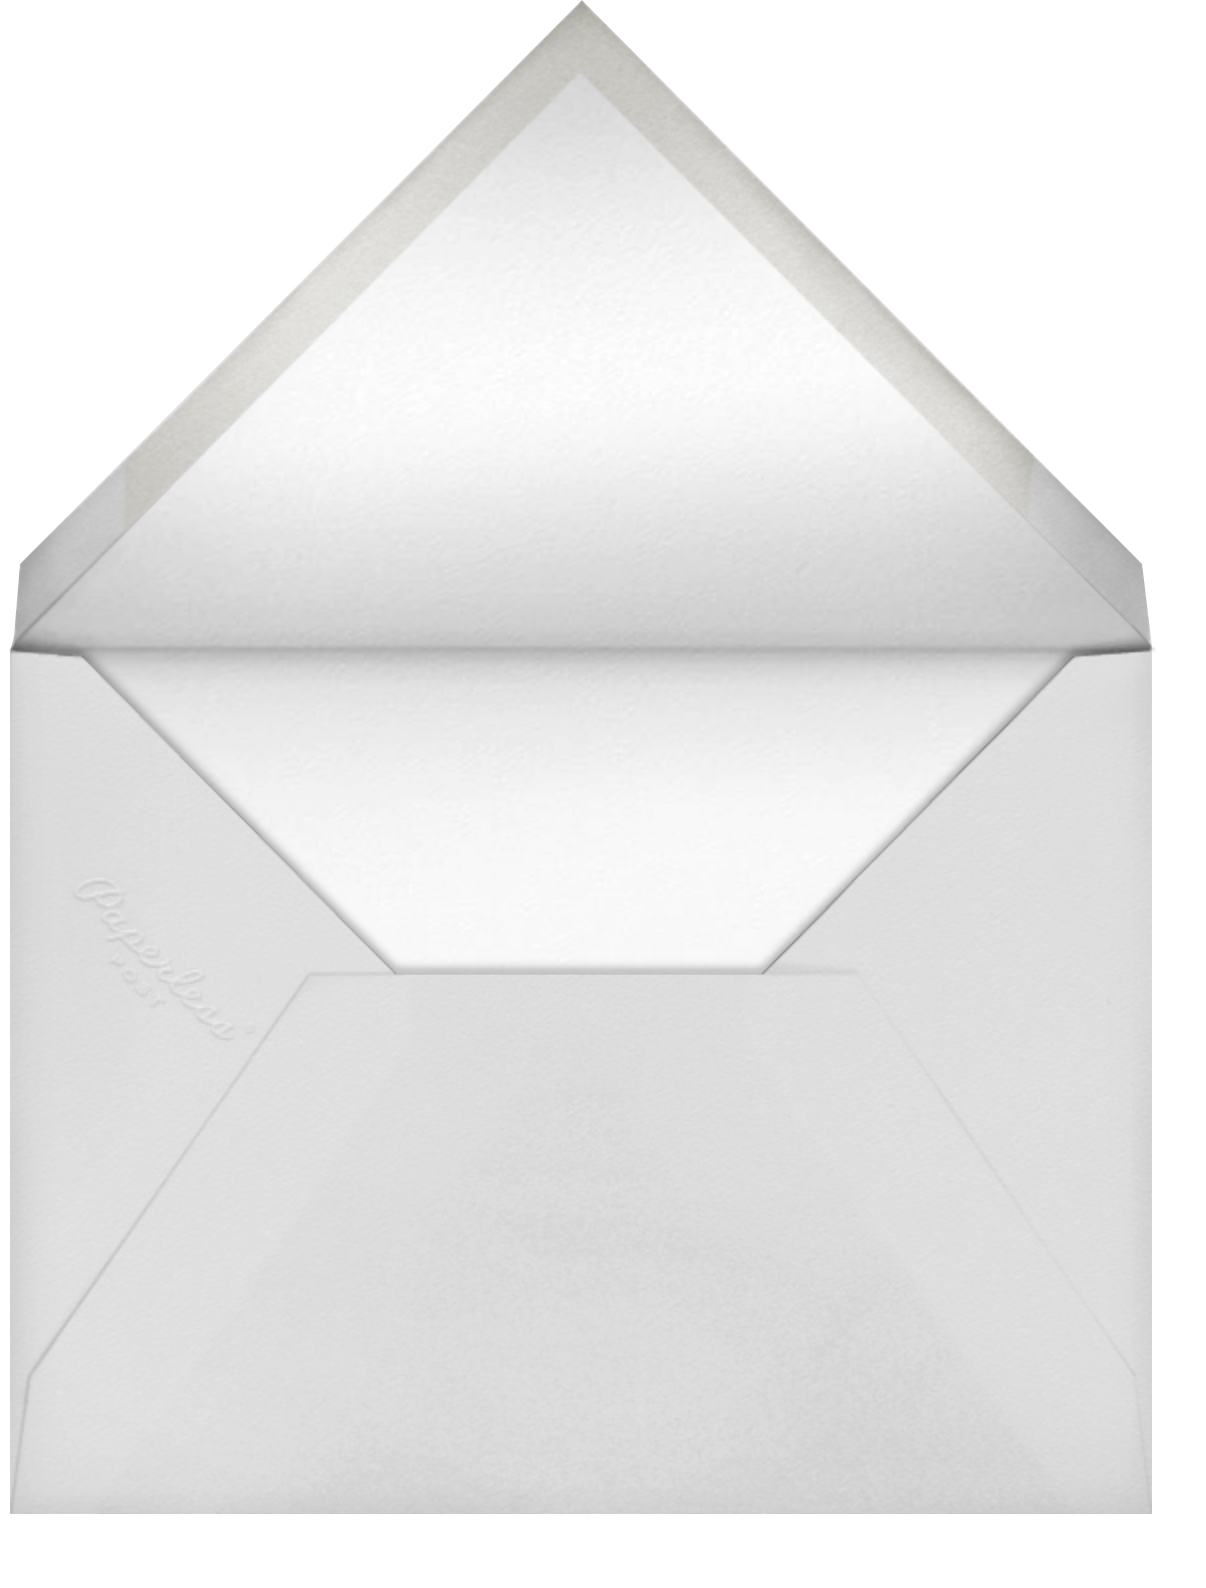 Unicorn (Yelena Bryksenkova) - Red Cap Cards - Envelope